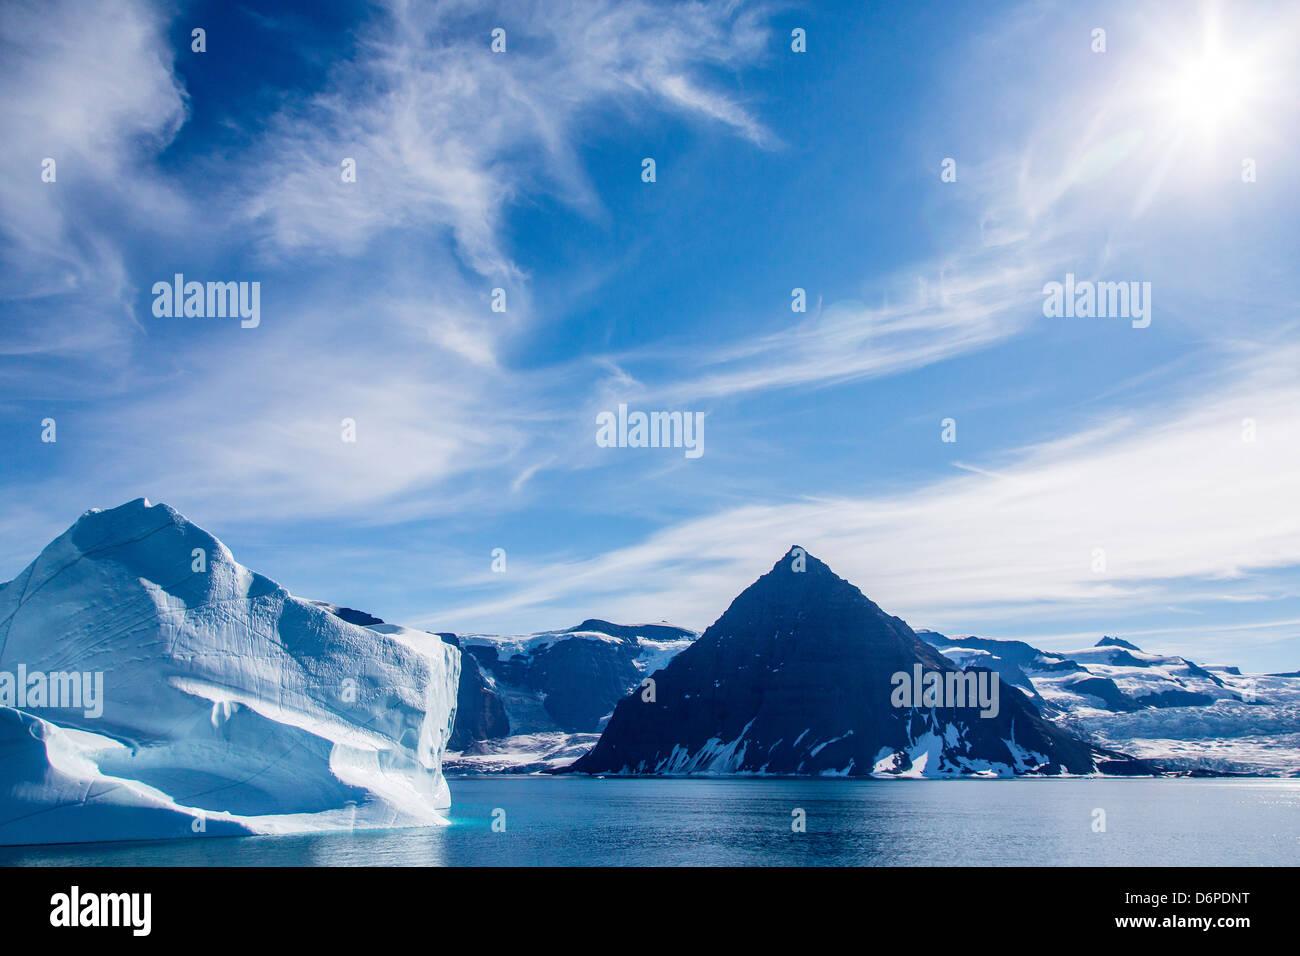 Immense iceberg, Scoresbysund, au nord-est du Groenland, les régions polaires Photo Stock